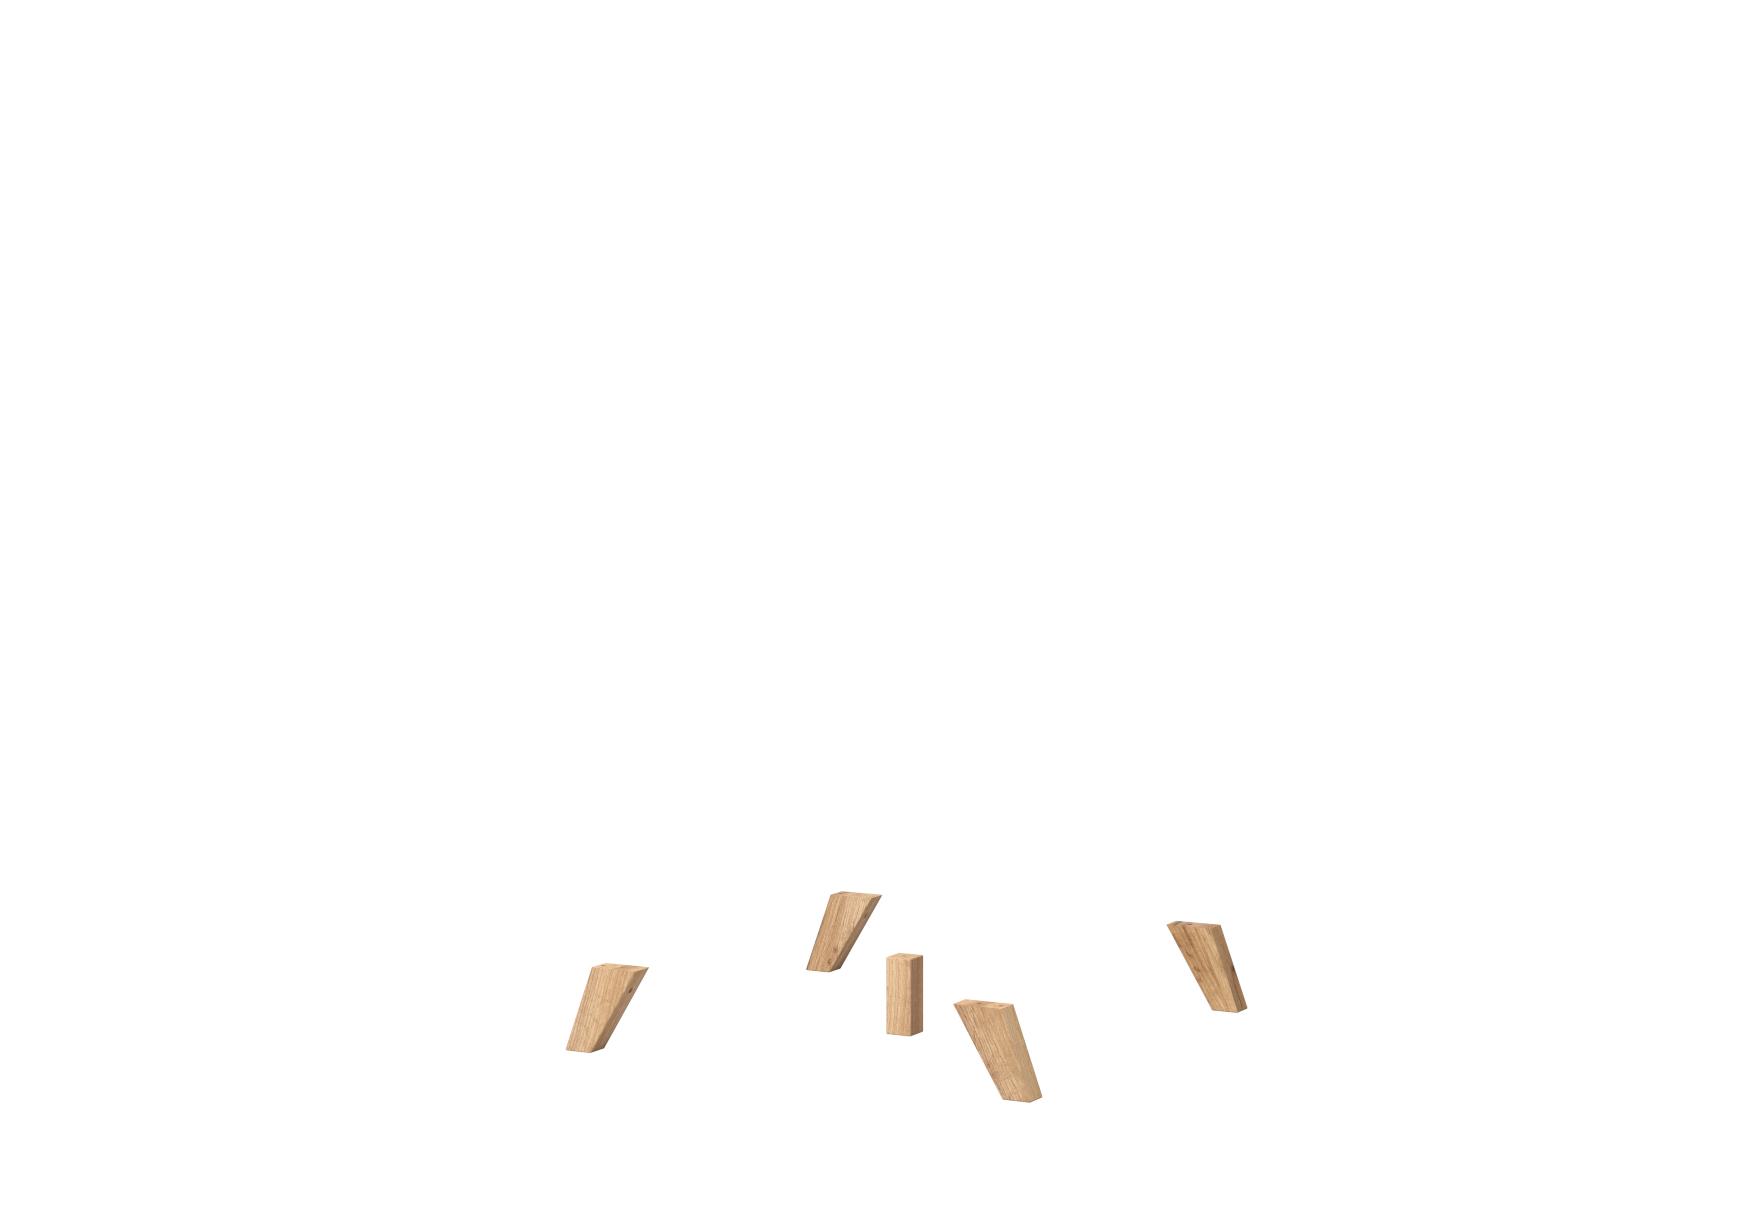 fuß-set 1 - hoch föhr massivholz navarra füße fuß schrankfüße